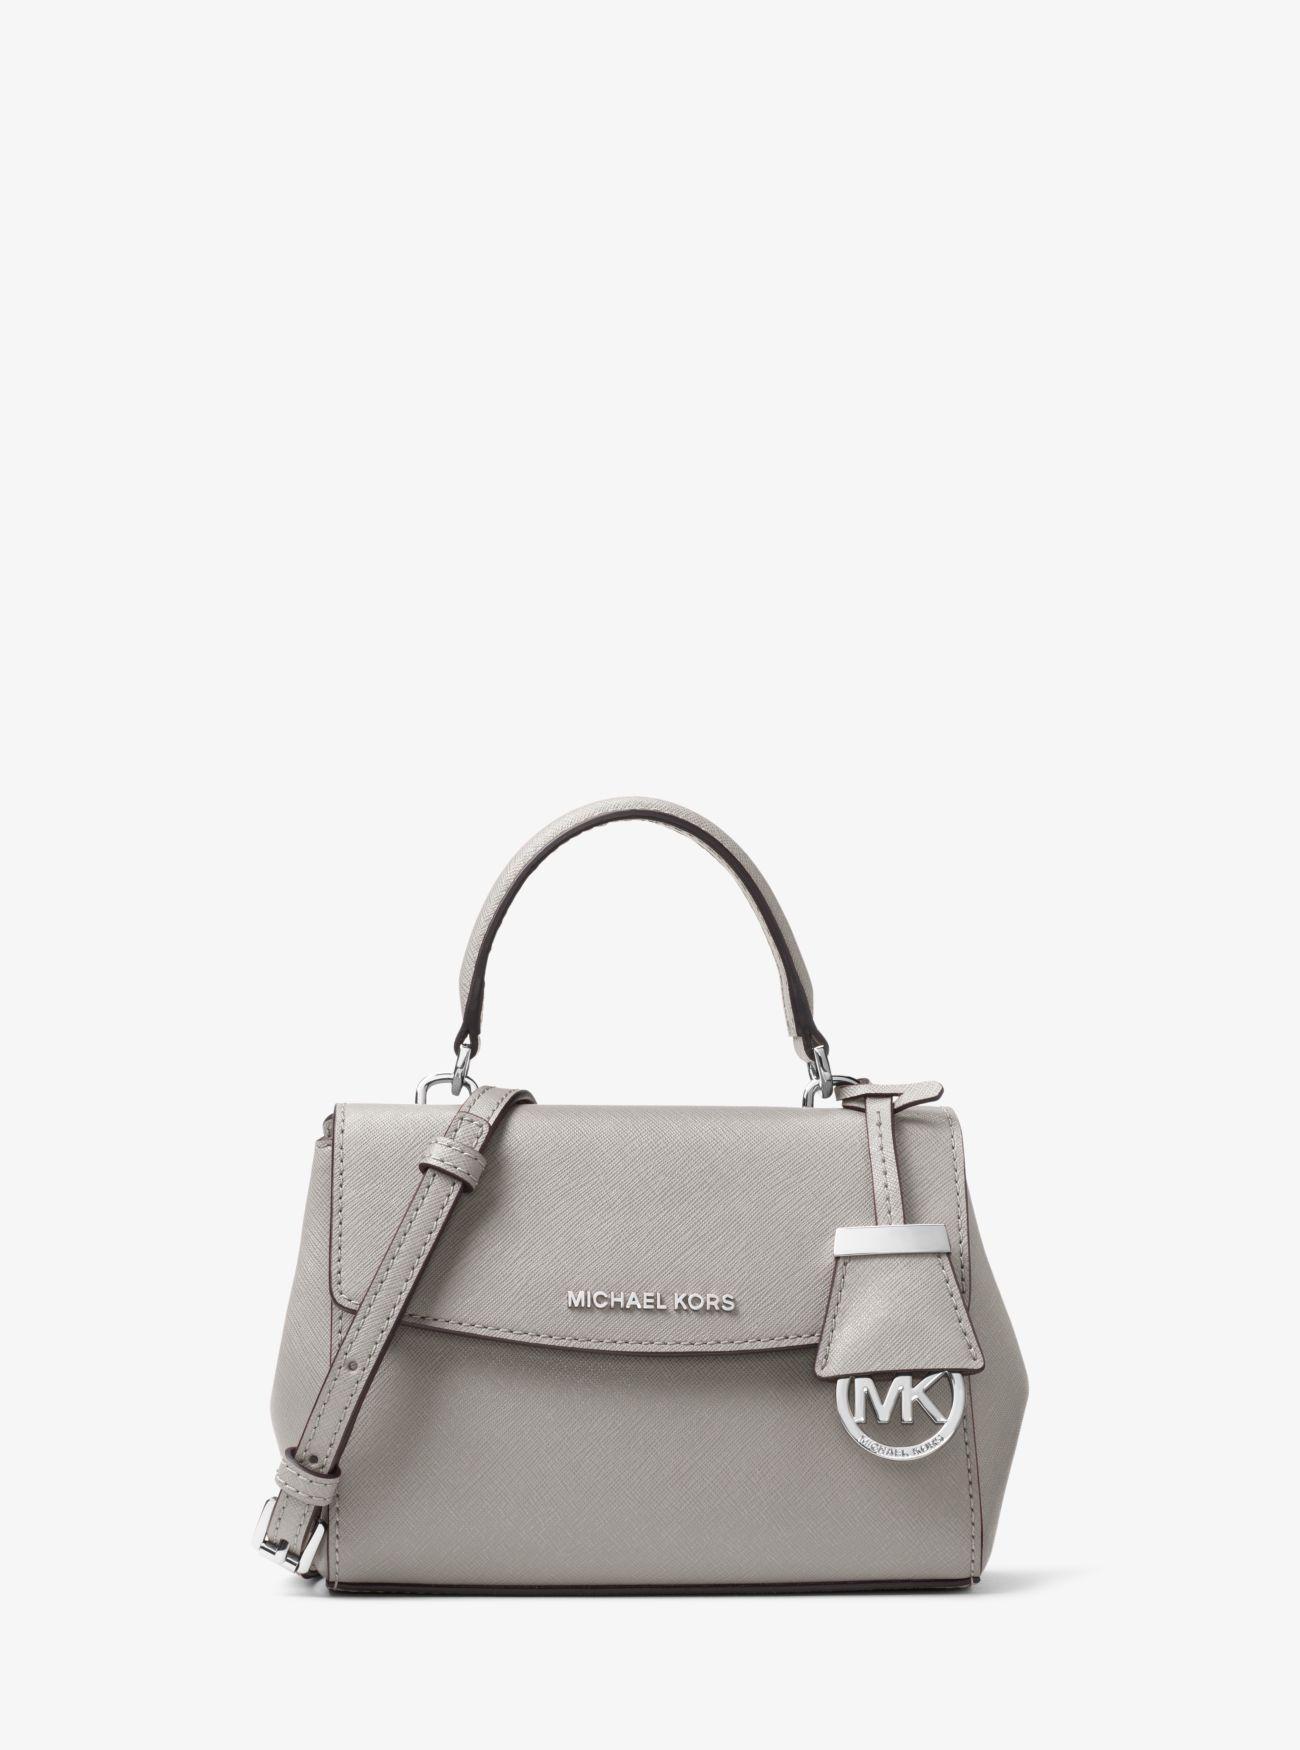 25d3106fc790 Michael Kors - Gray Ava Extra-small Saffiano Leather Crossbody Bag - Lyst.  View fullscreen